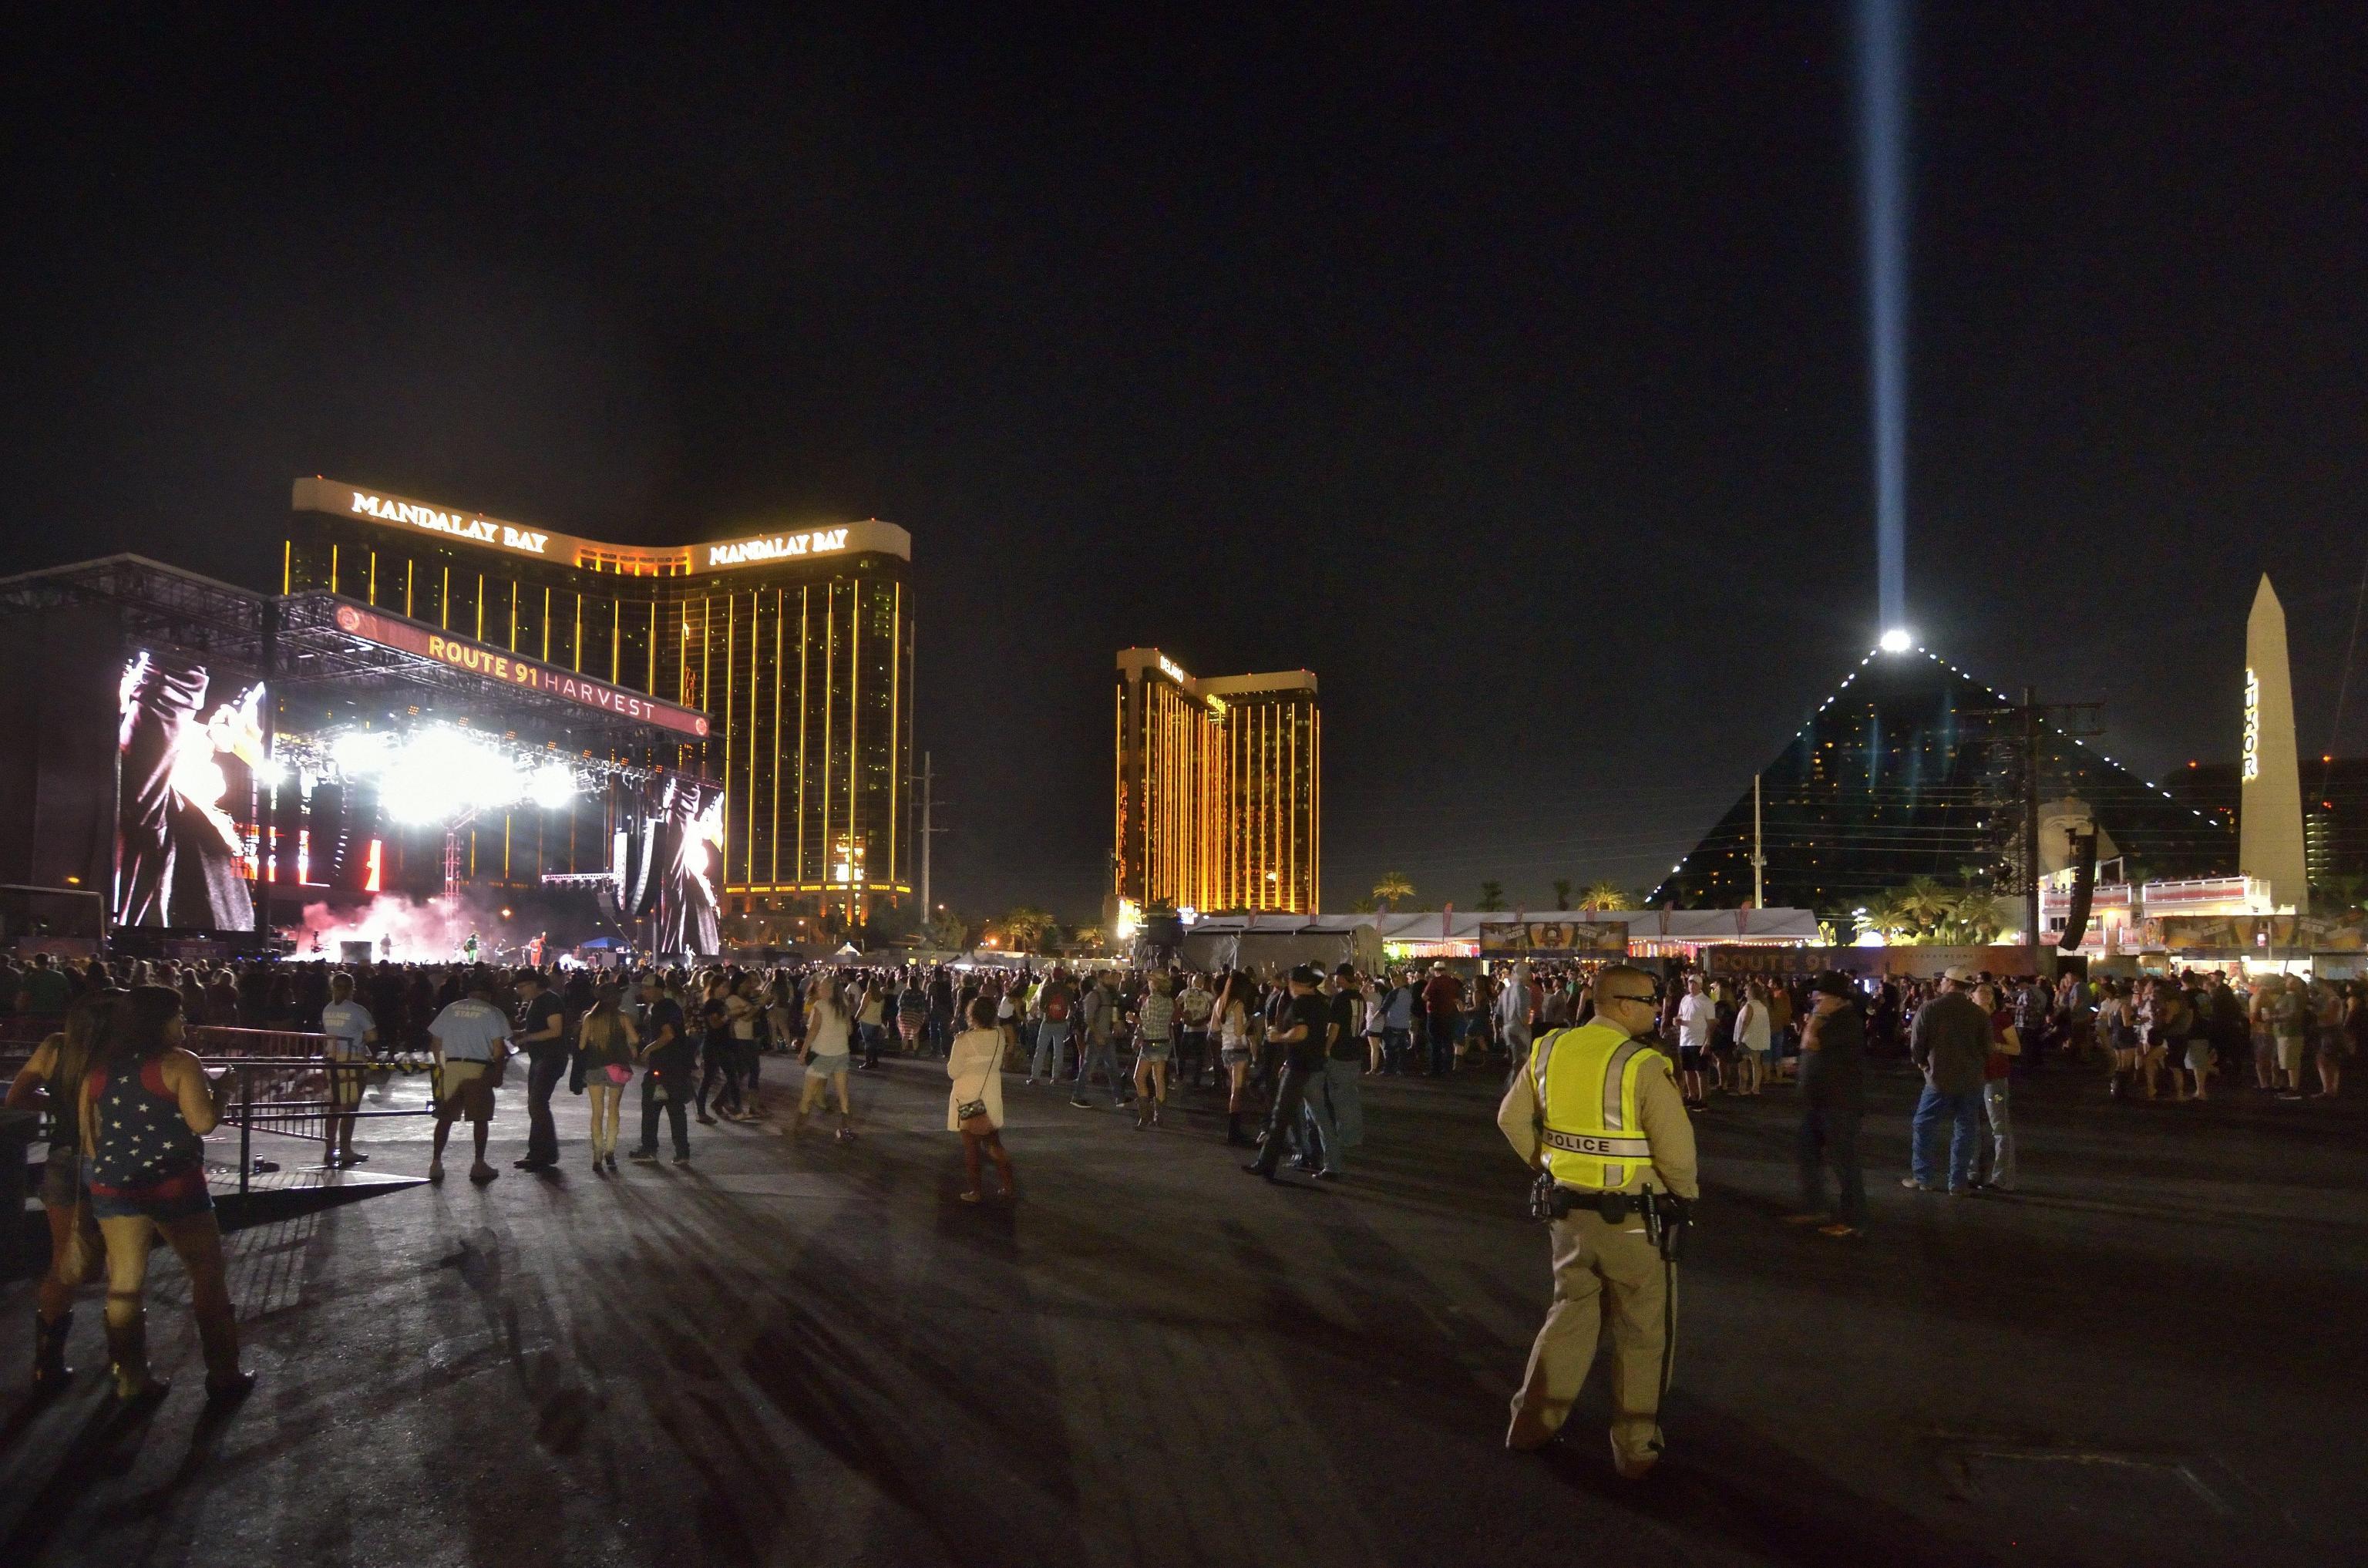 Sparatoria Las Vegas Route 91 Harvest festival